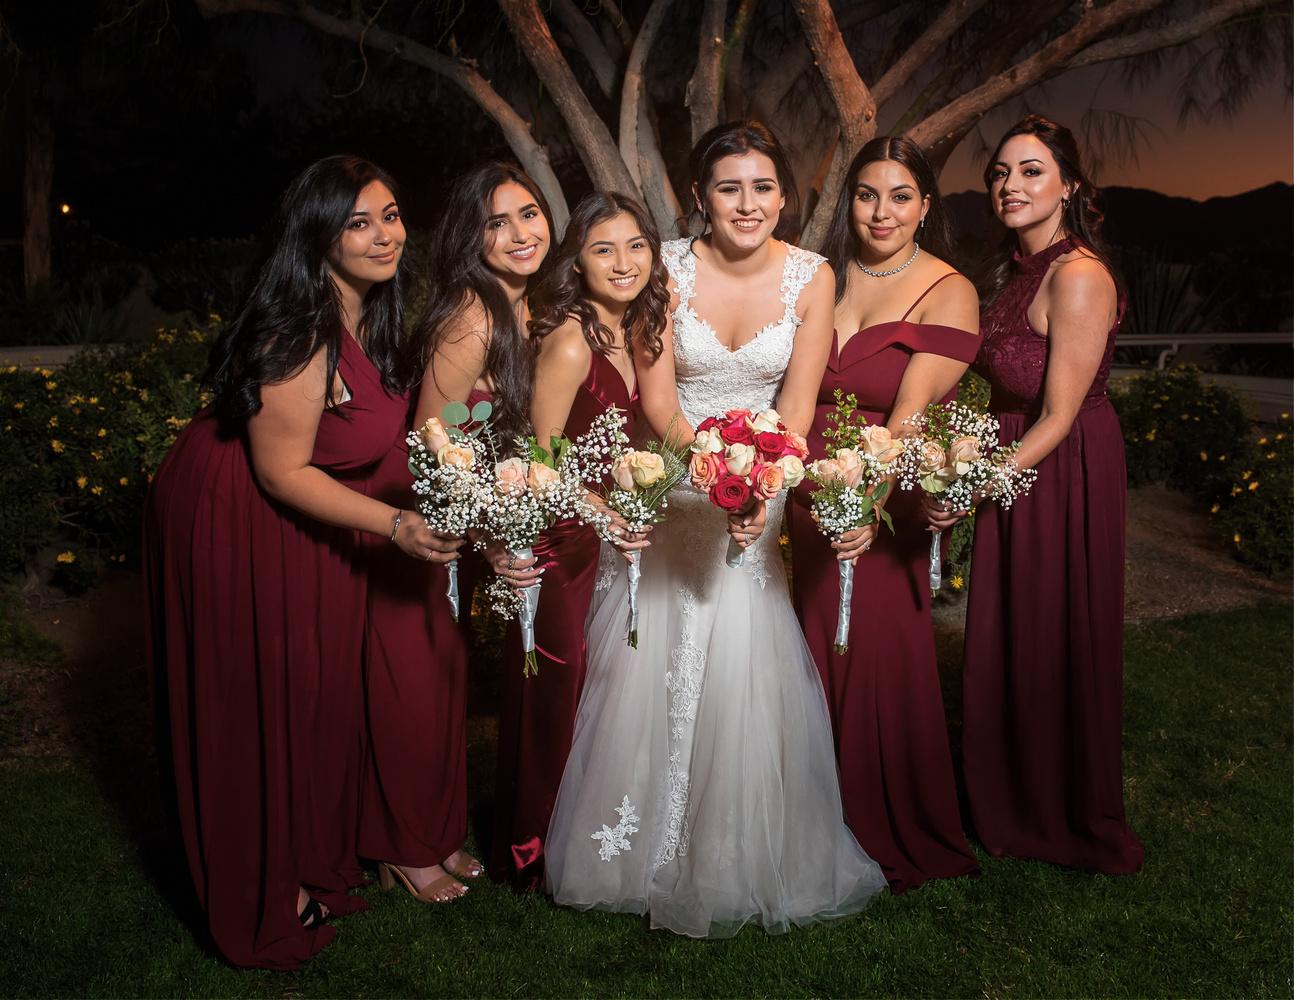 Bridesmaids by Scott Pam